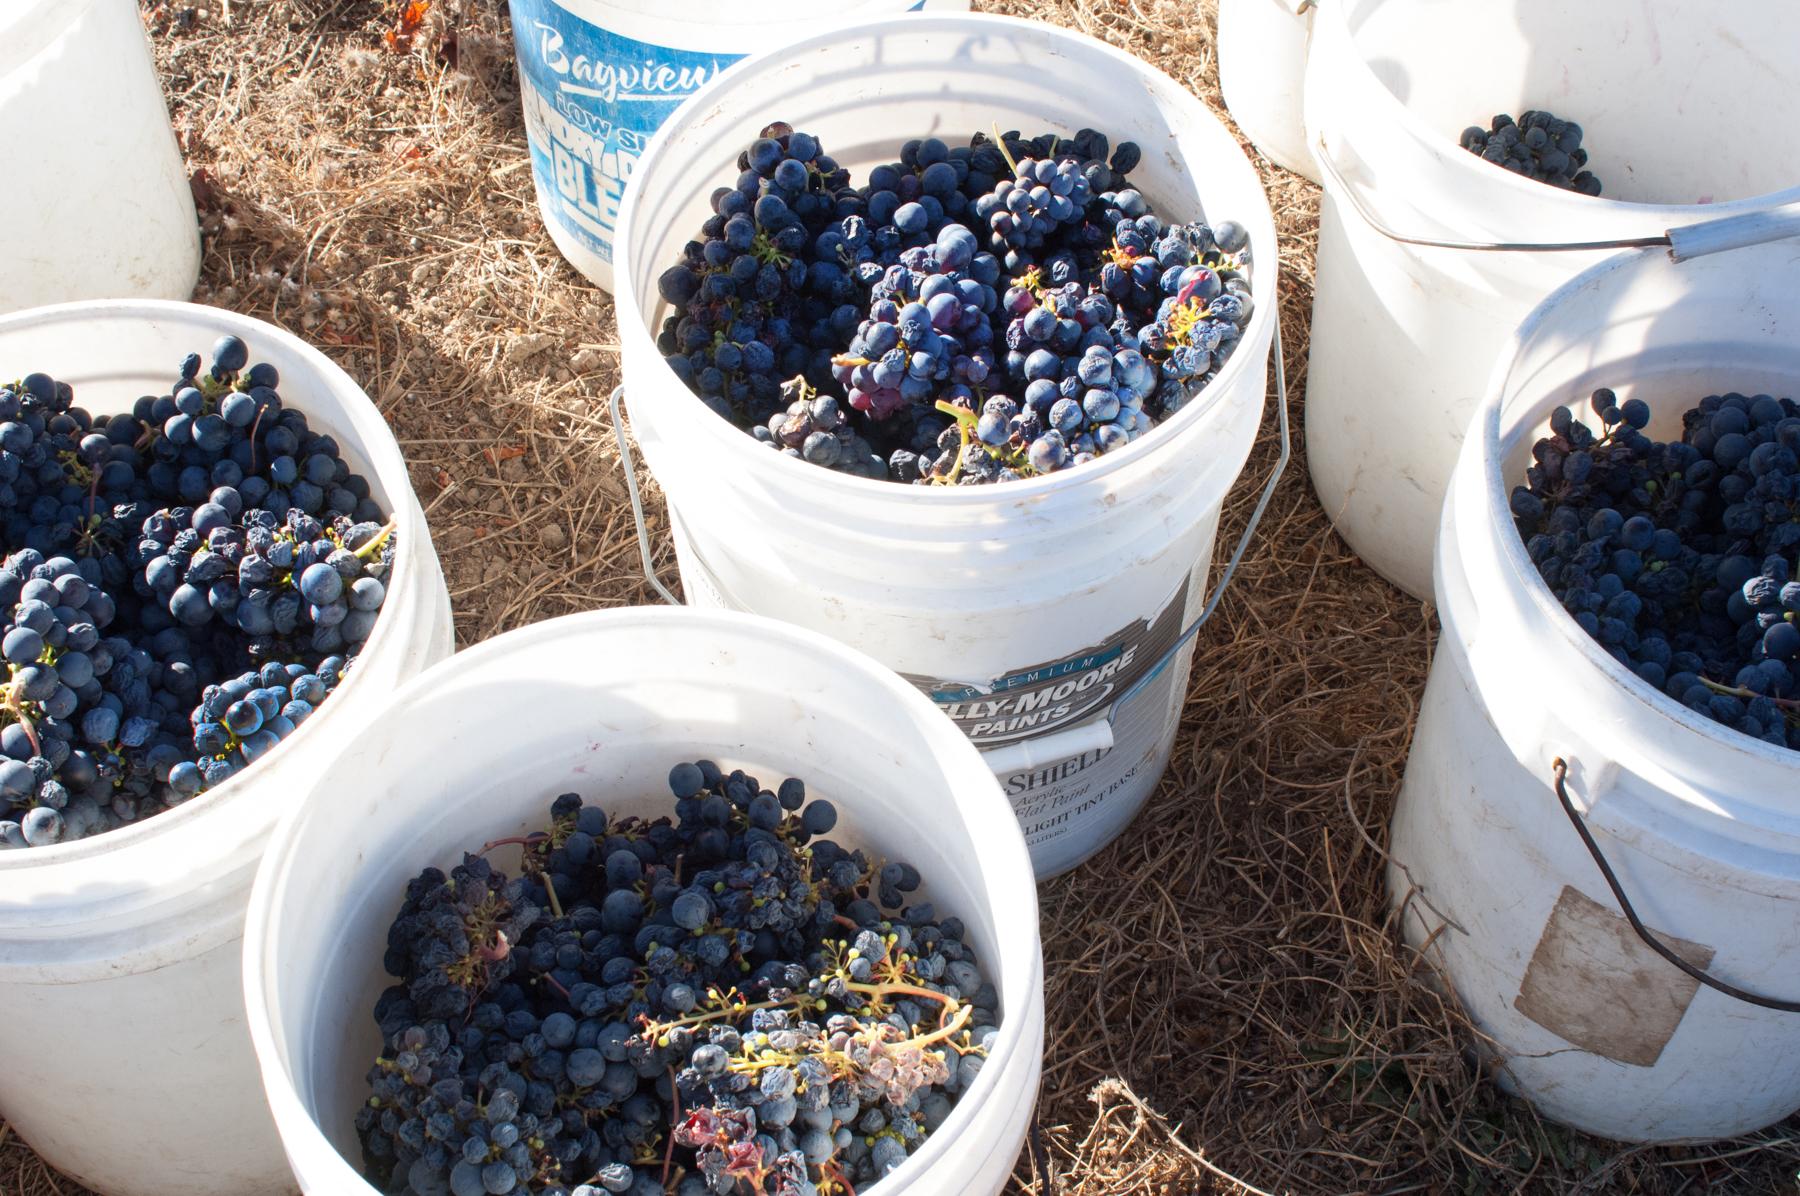 Sav Chan blue cherries plucking